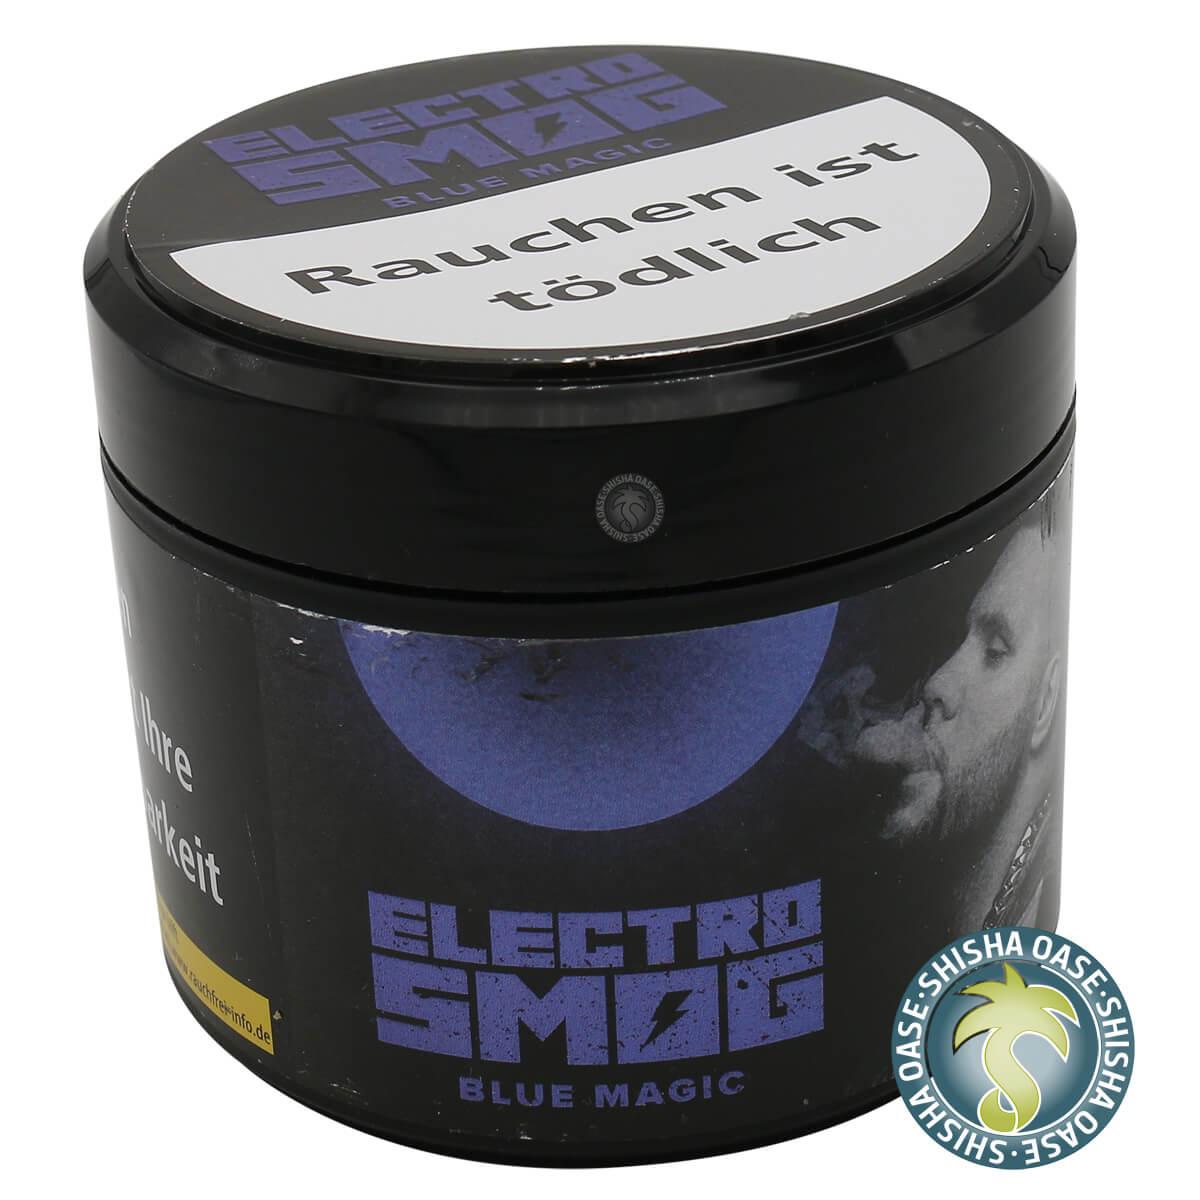 Electro Smog Tabak 200g | Blue Magic